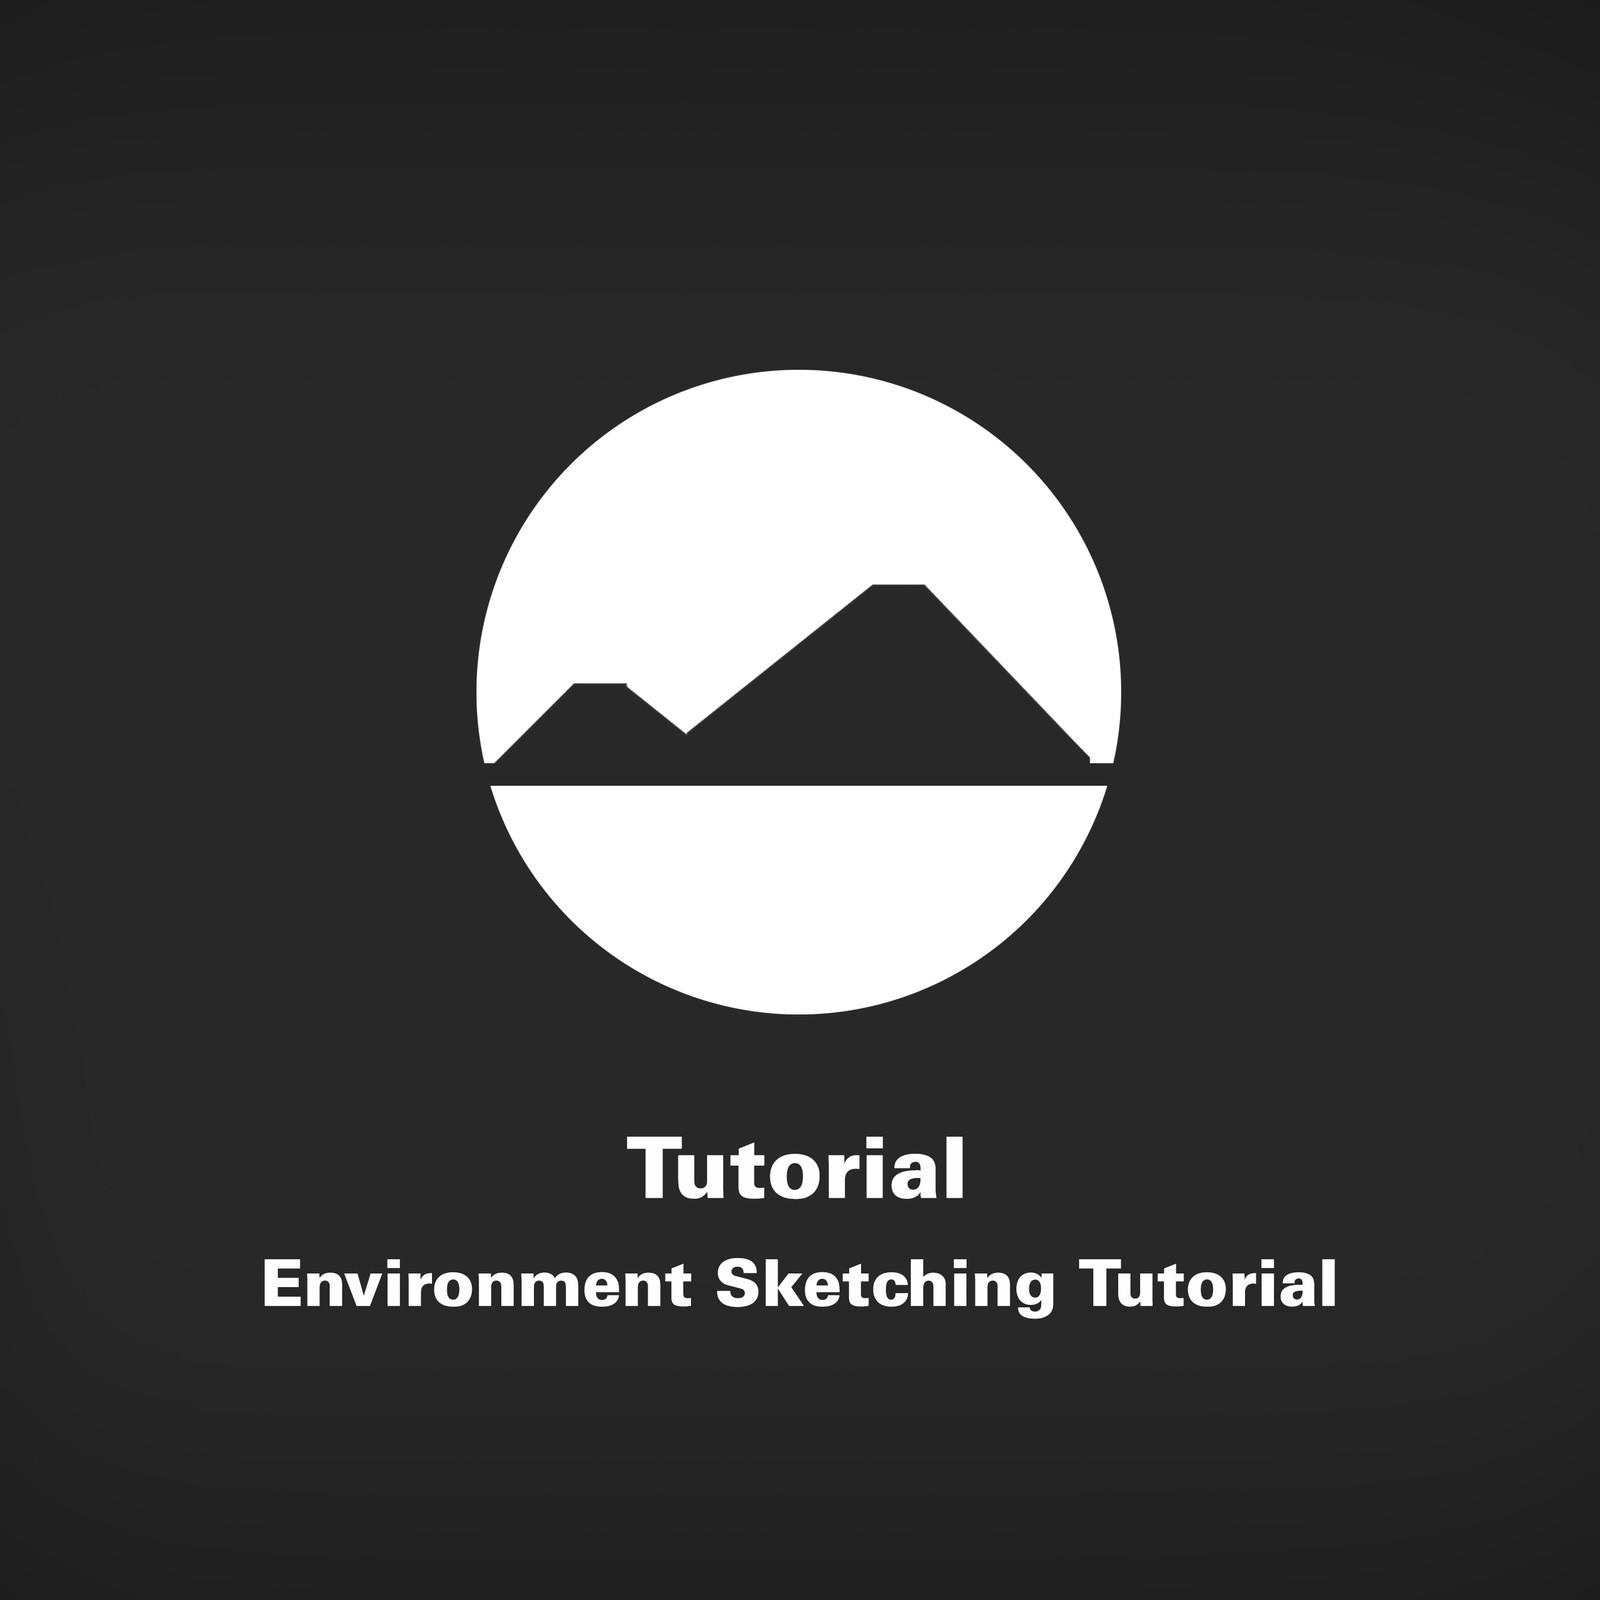 Tutorial: Sketching Process